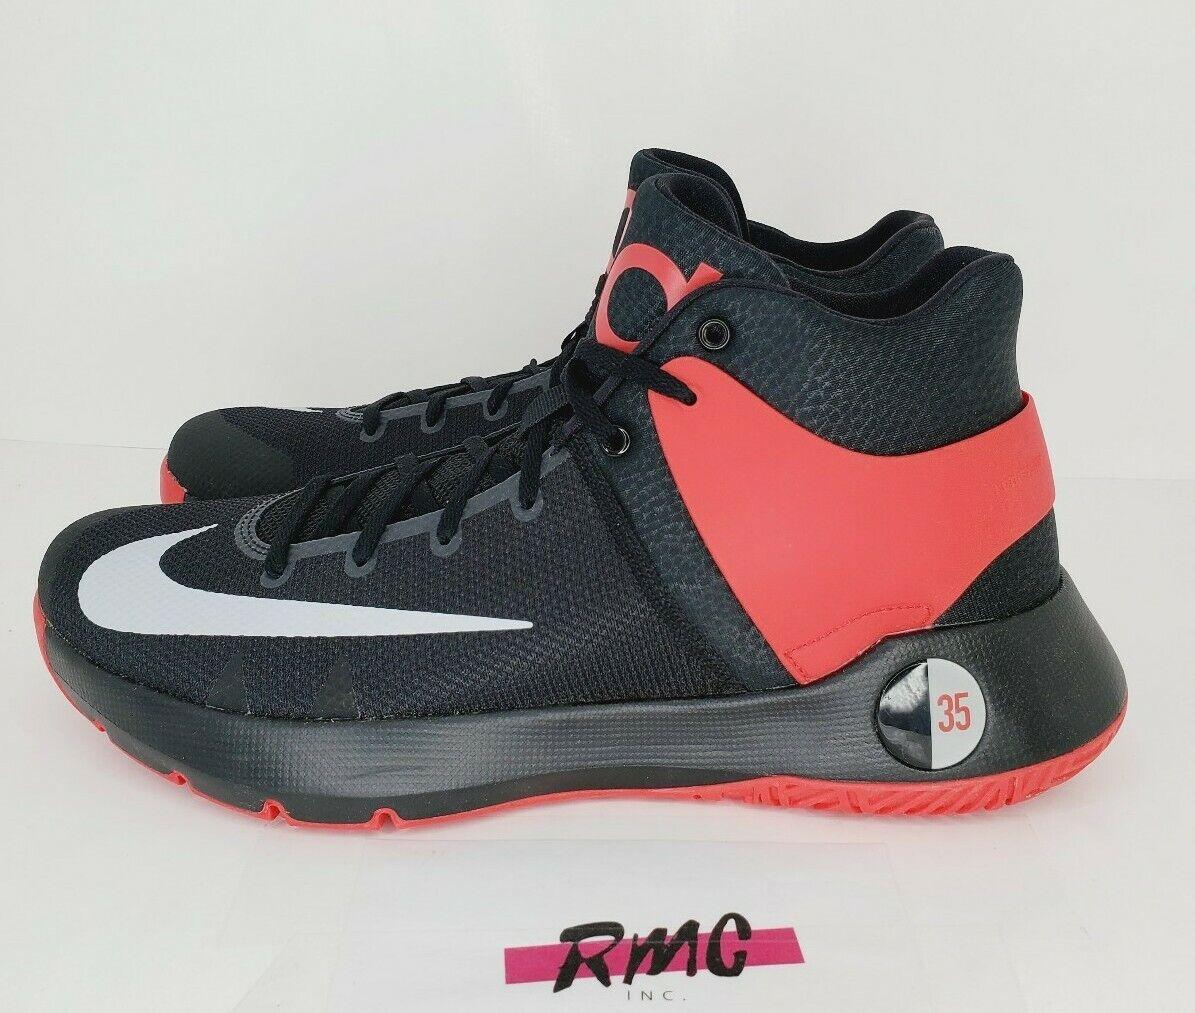 Nike KD Trey 5 IV Basketball Shoes